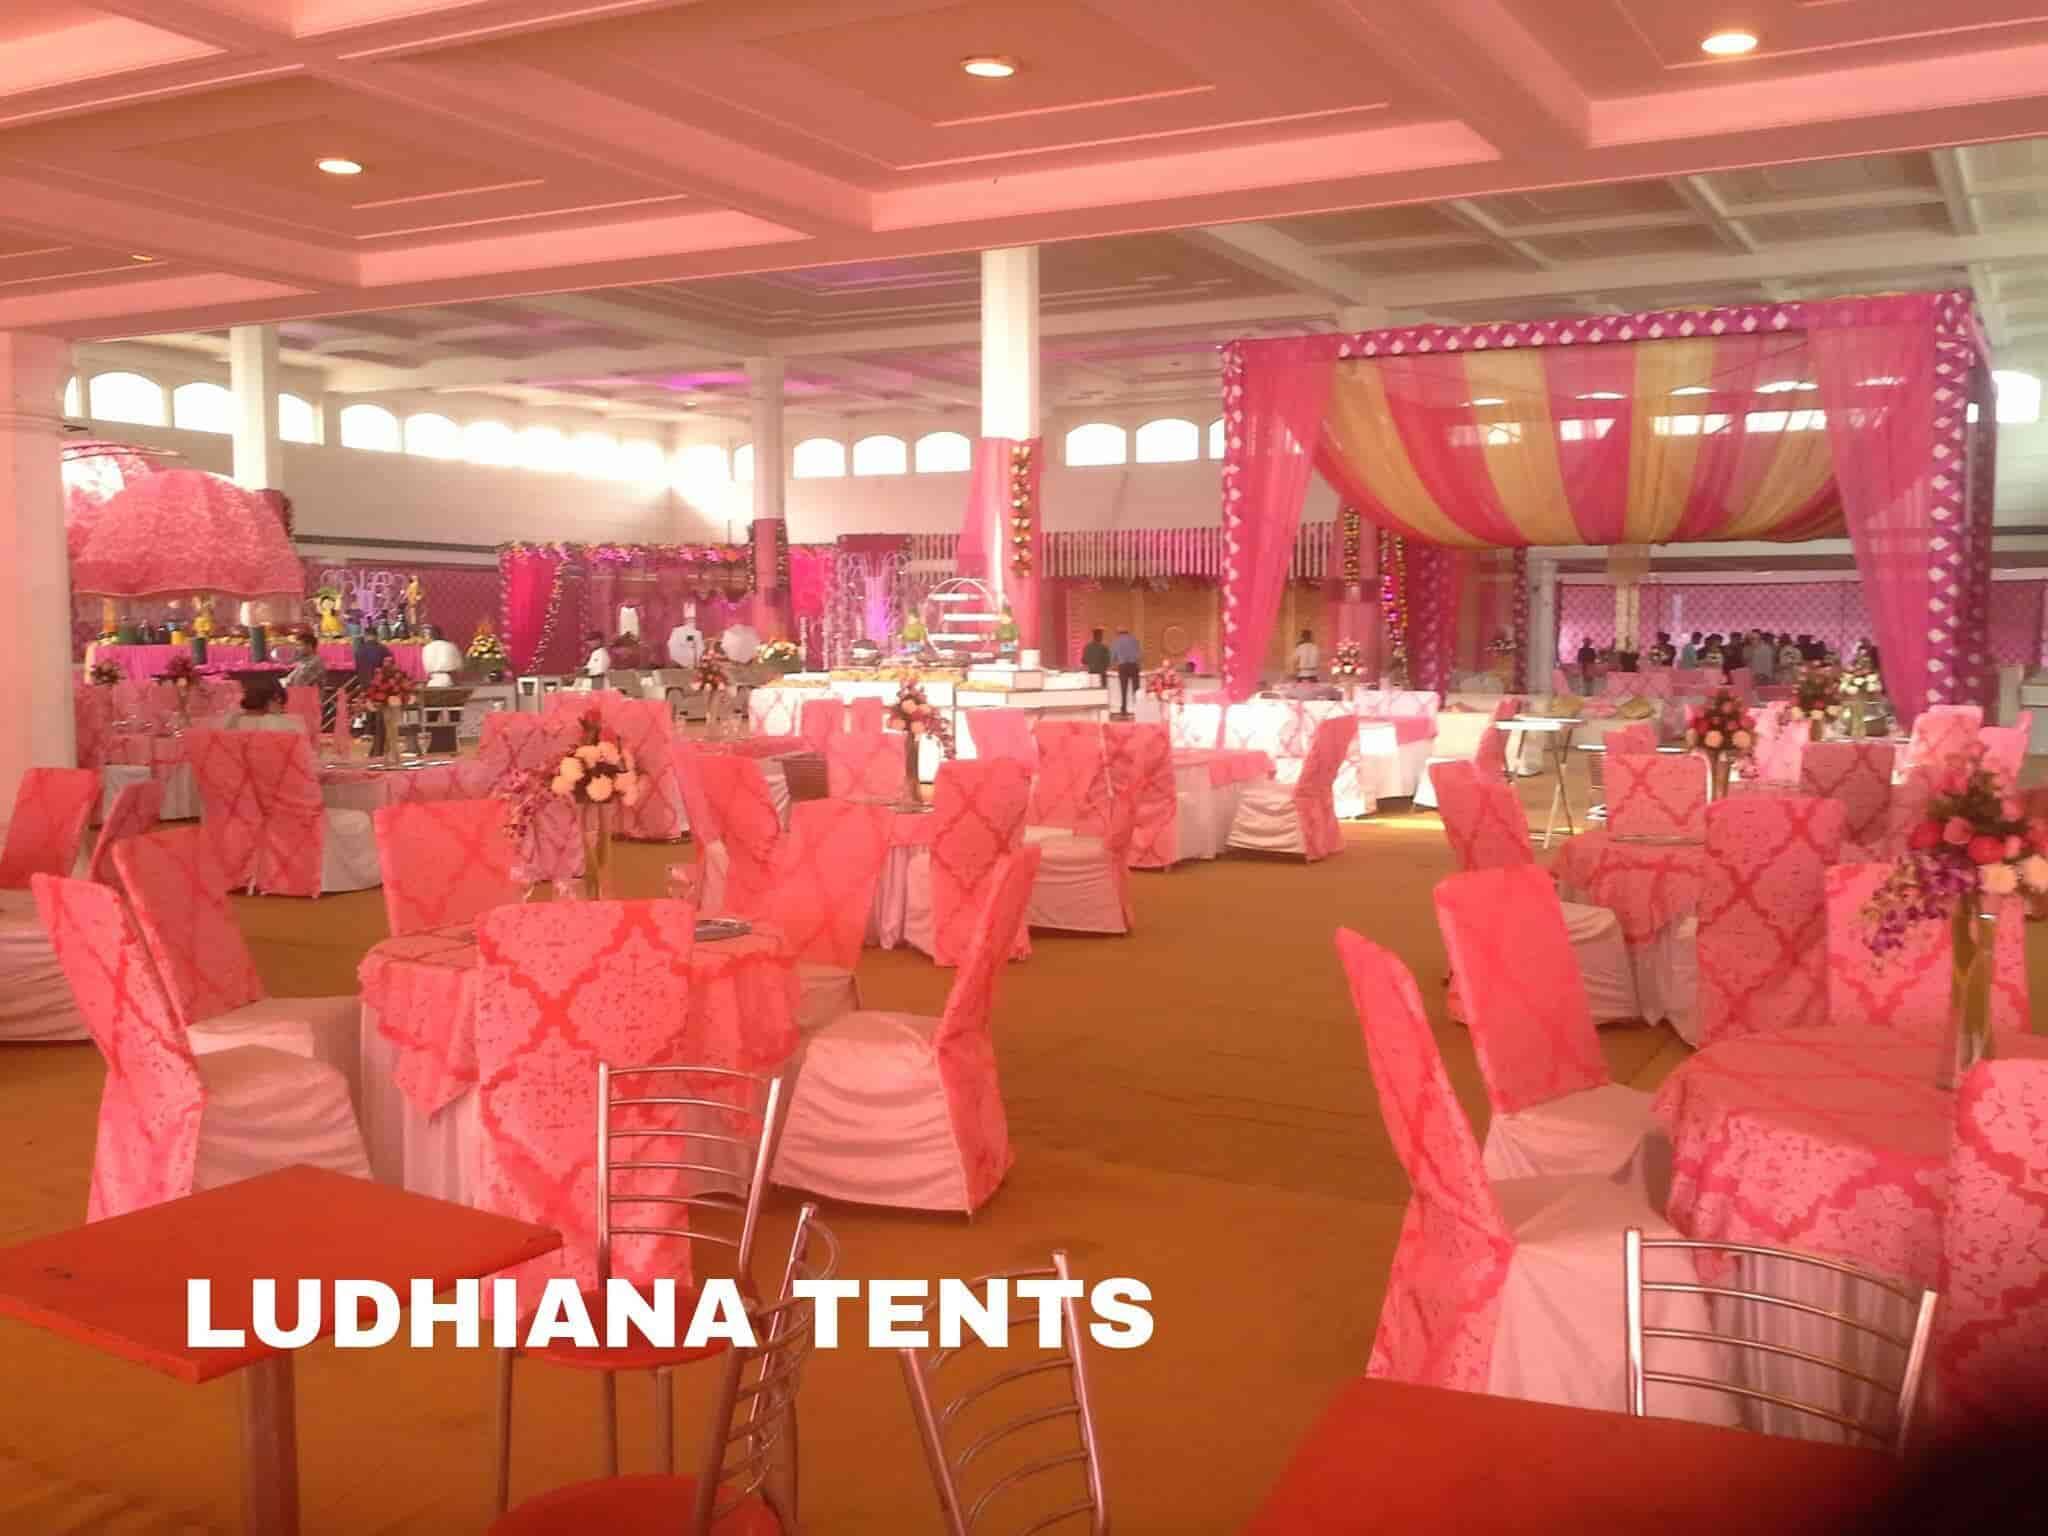 Ludhiana tents and caterers photos krishna puri delhi ncr tent house decoration ludhiana tents and caterers photos krishna puri delhi tent junglespirit Gallery